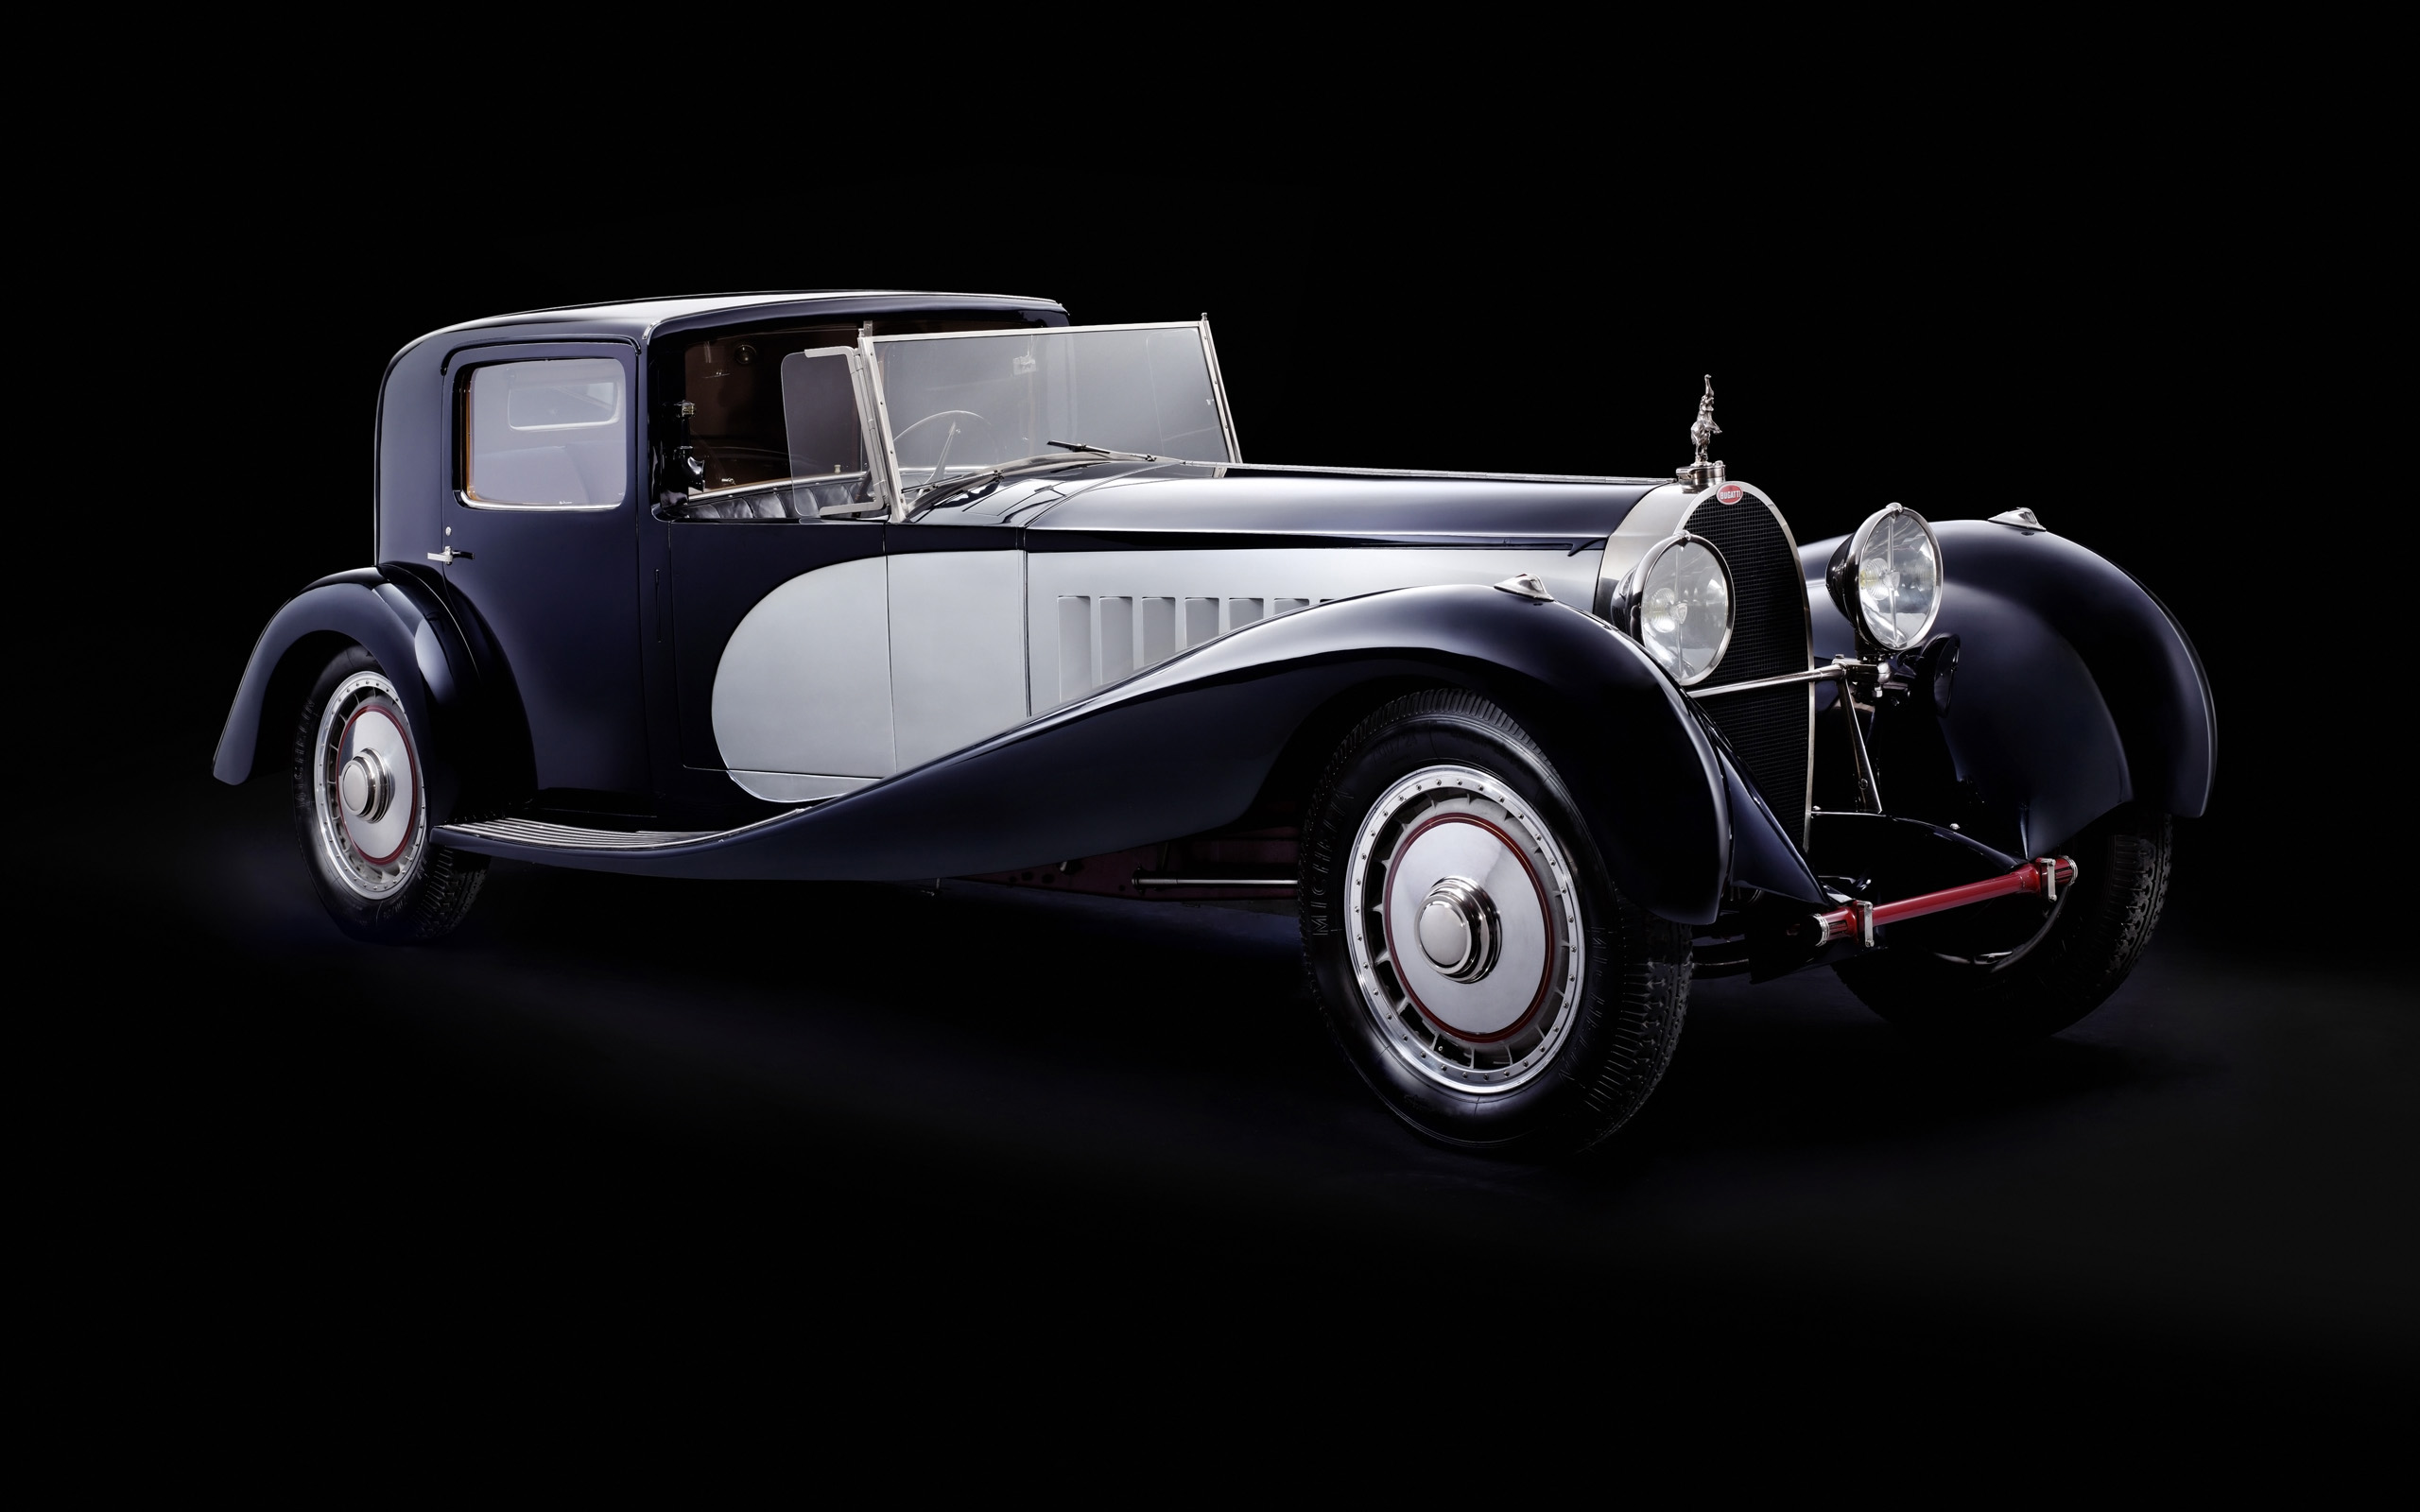 Iphone 4 Blueprint Wallpaper 1932 Bugatti Type 41 Royale Wallpaper Hd Car Wallpapers